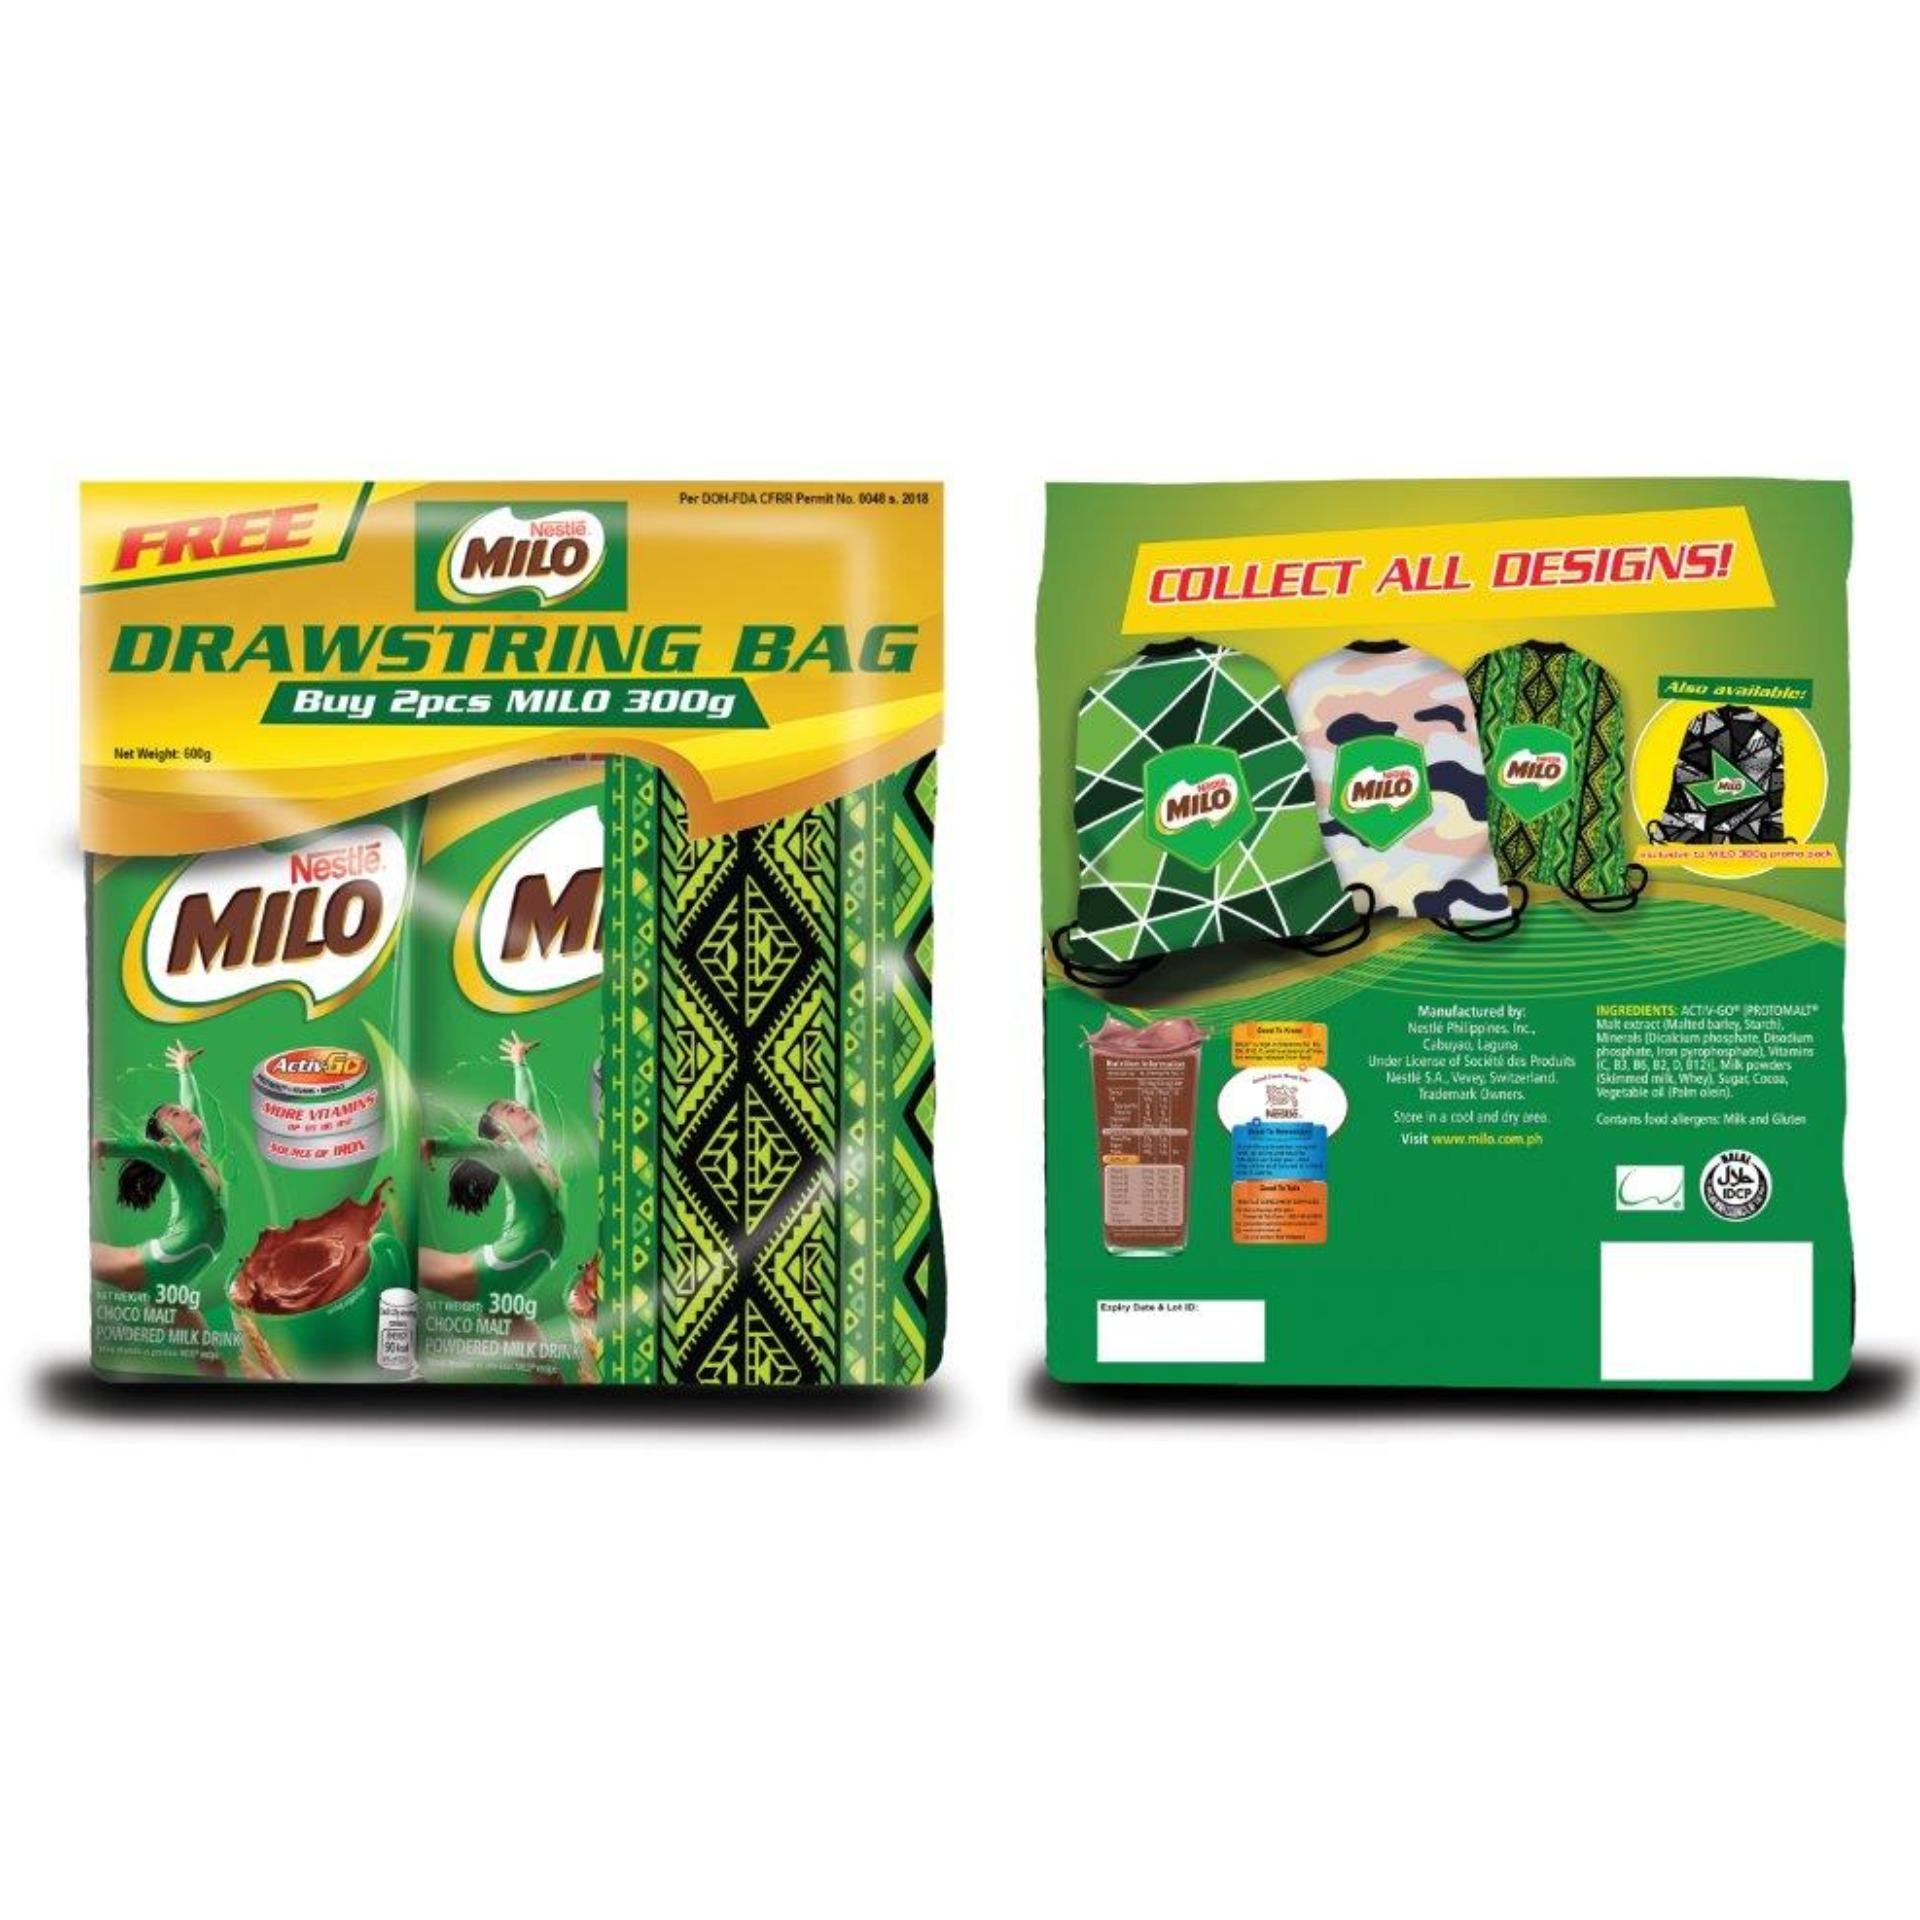 Milo Philippines Price List Nutri Up Chocolate Energy Drink Sachet Champion 300g Pack Of 2 Free Drawstring Bag